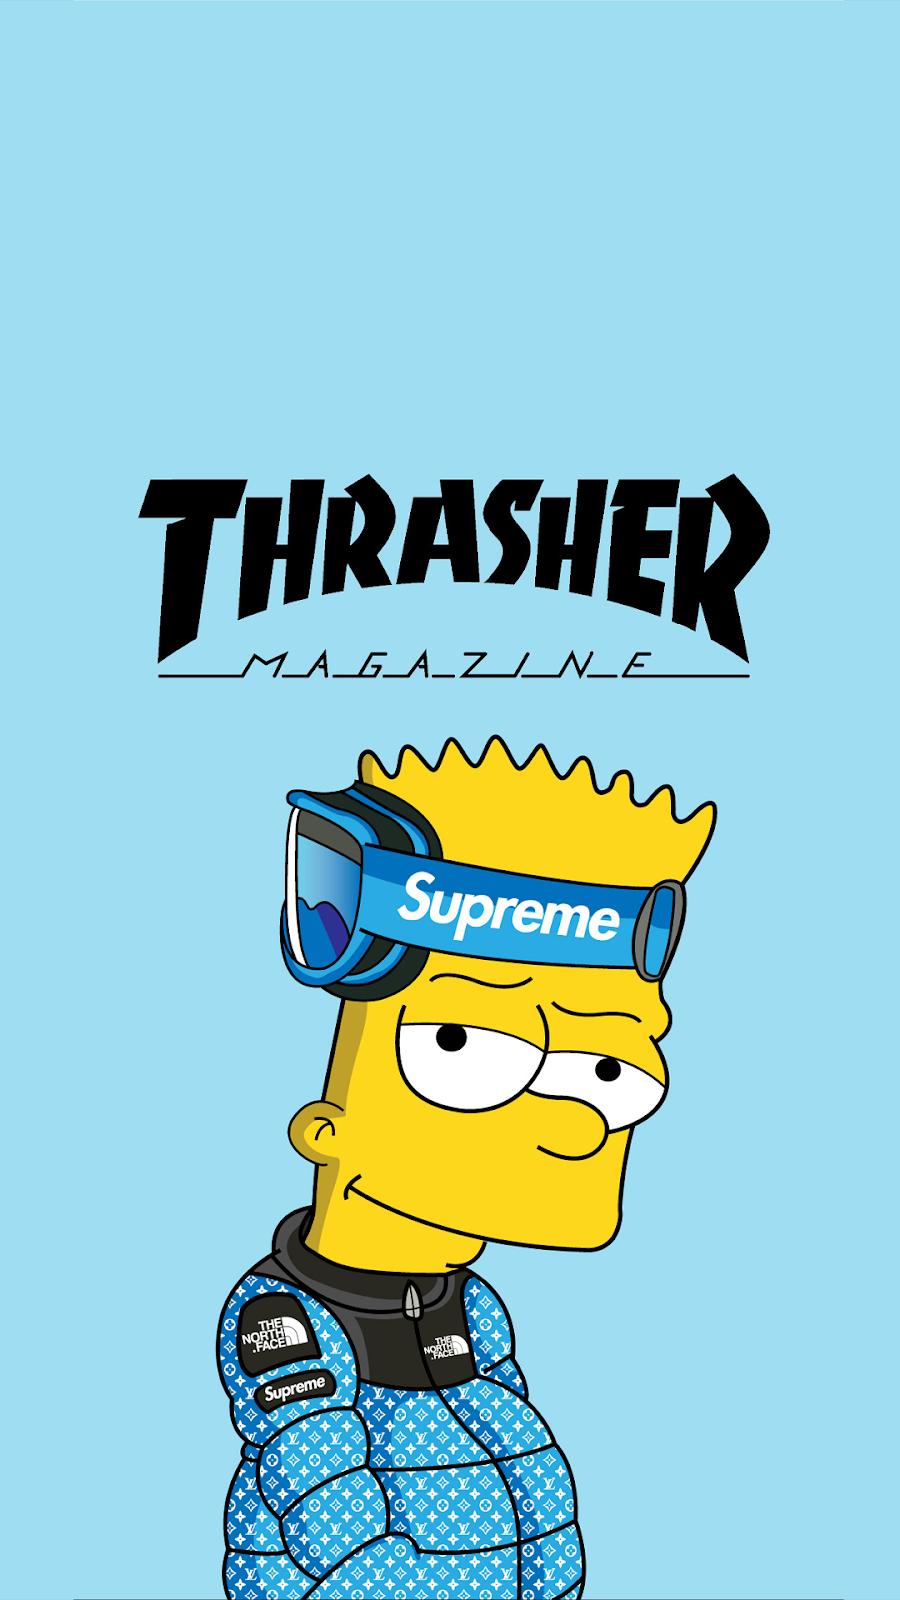 Wallpapers Simpsons Para Celular Android Iphone Atc Bart Simpson Art Supreme Iphone Wallpaper Supreme Wallpaper